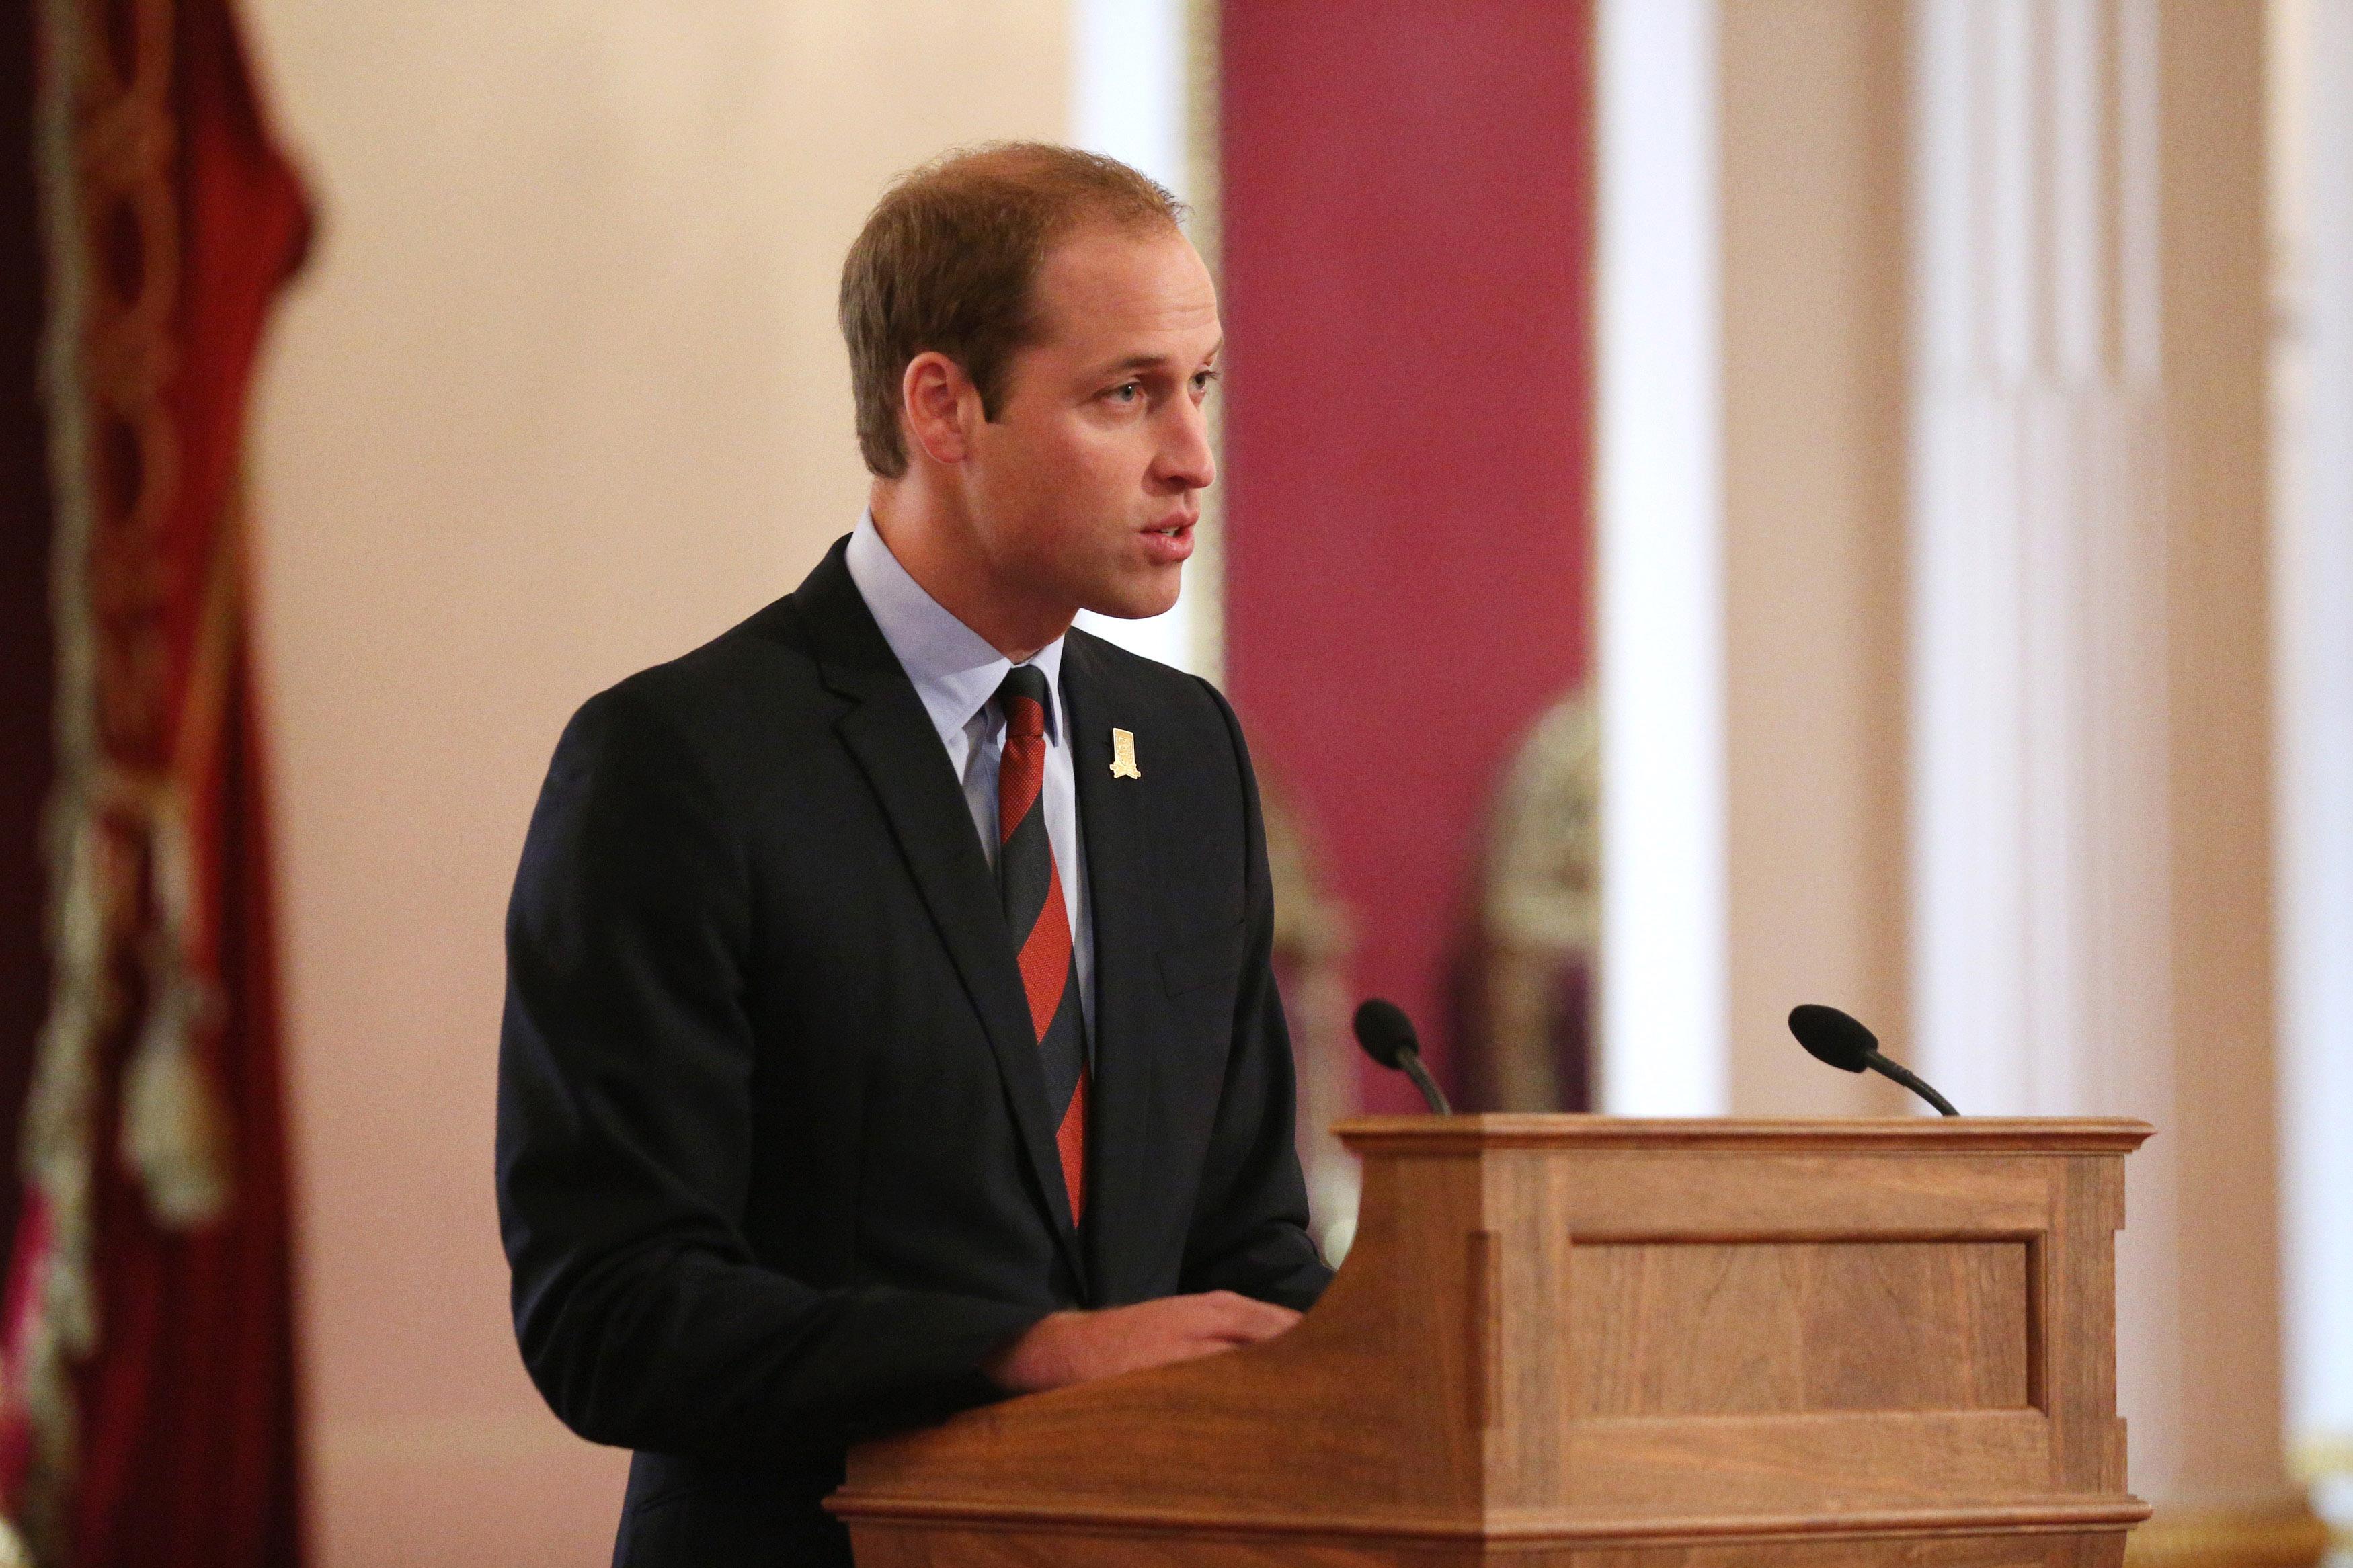 prince william medal ceremony